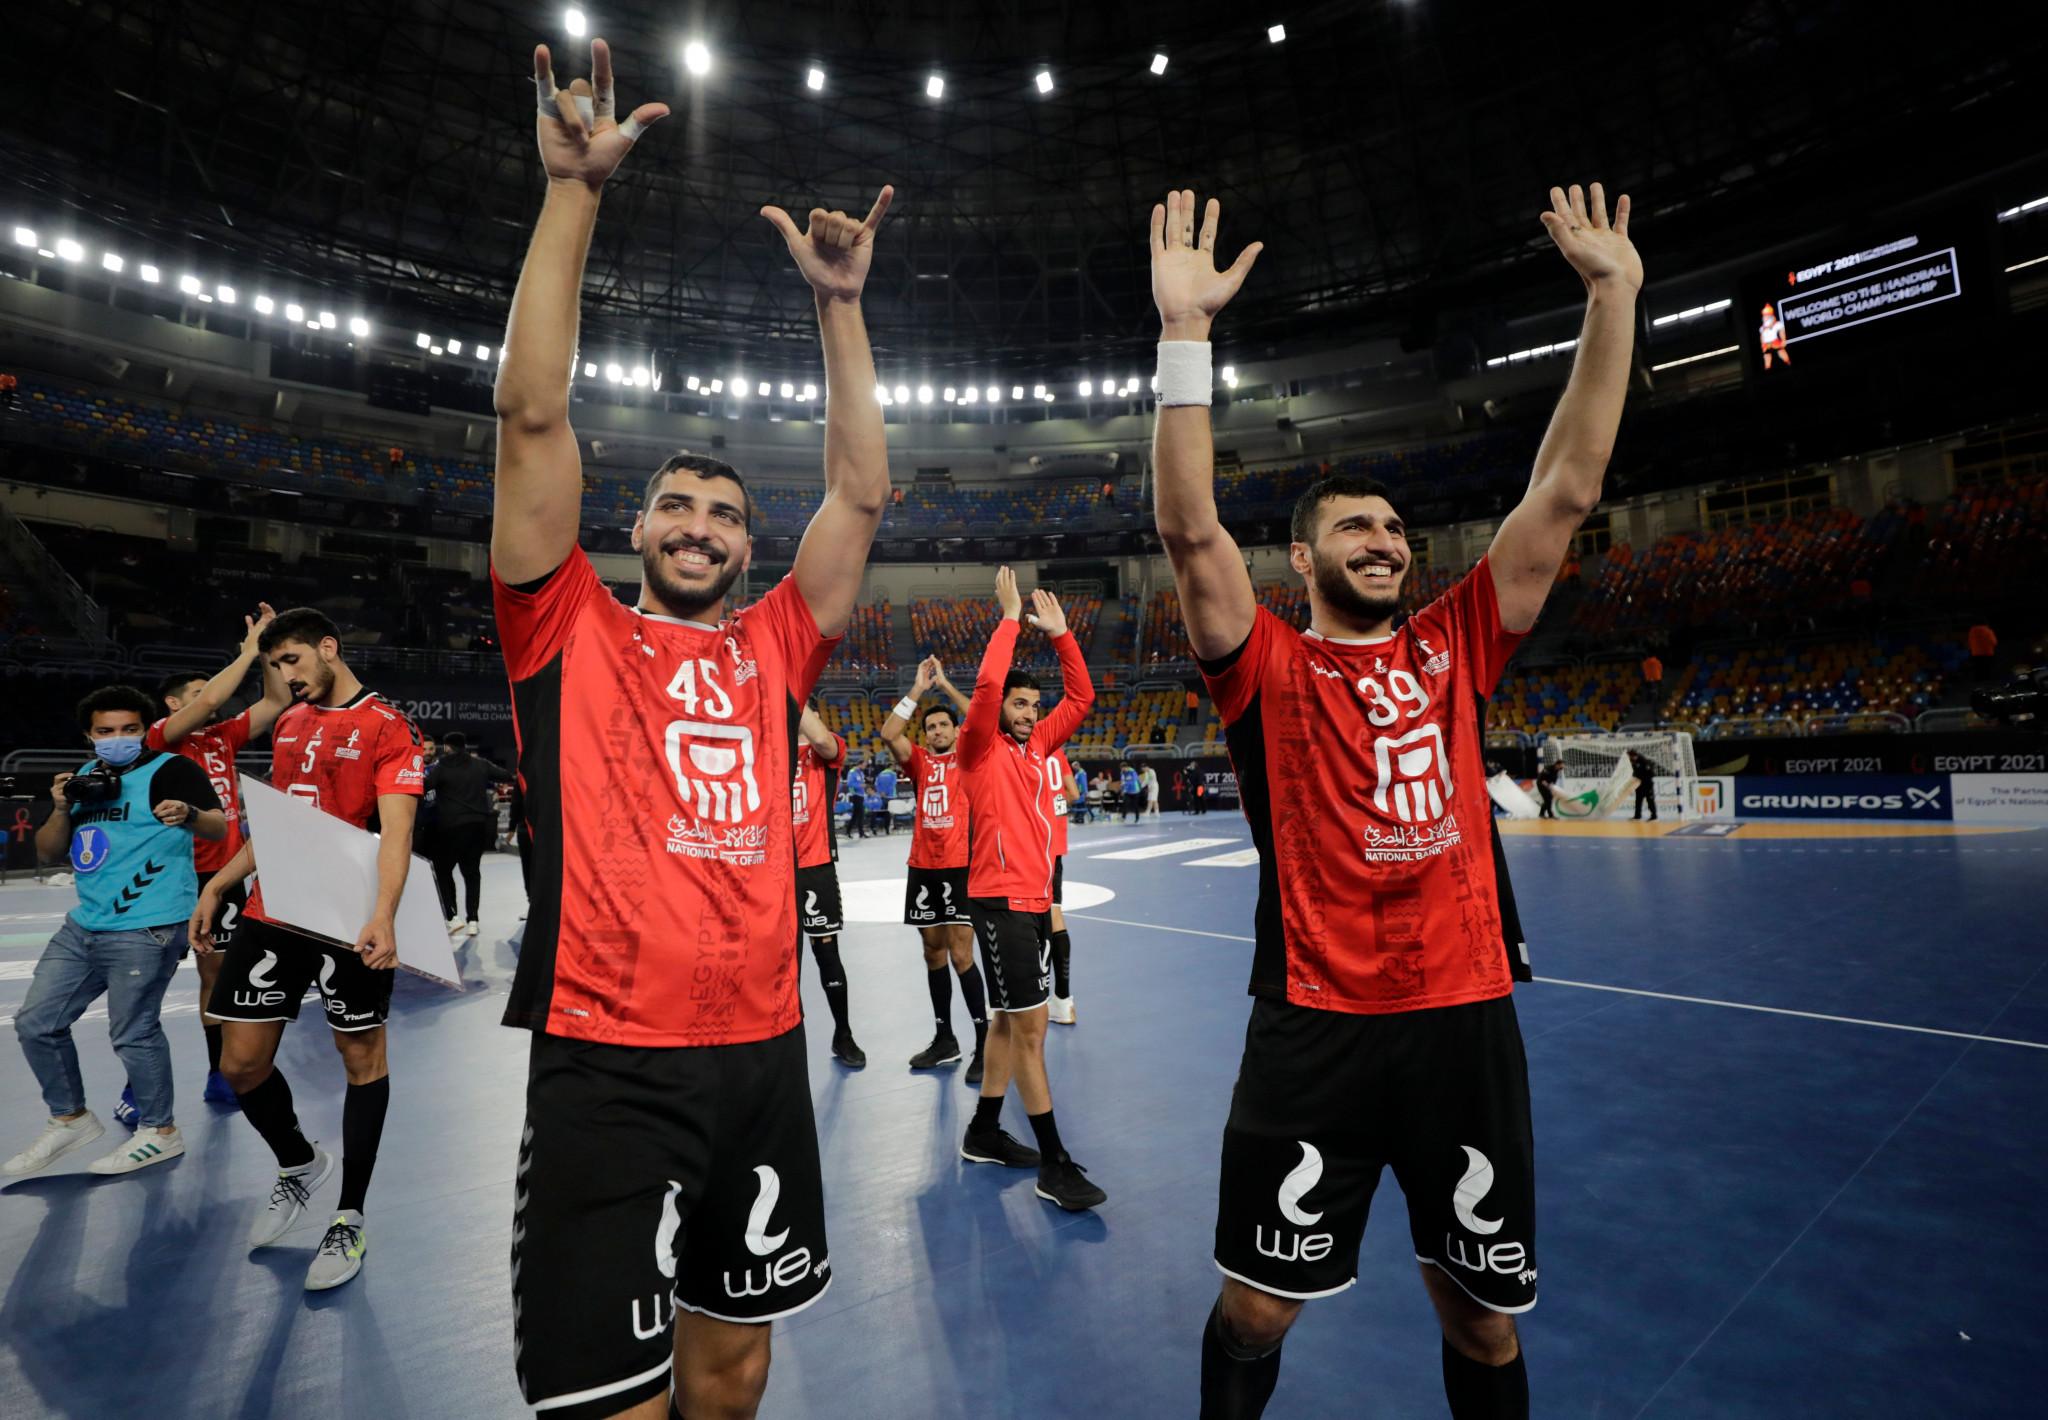 Hosts Egypt into World Men's Handball Championship quarter-finals